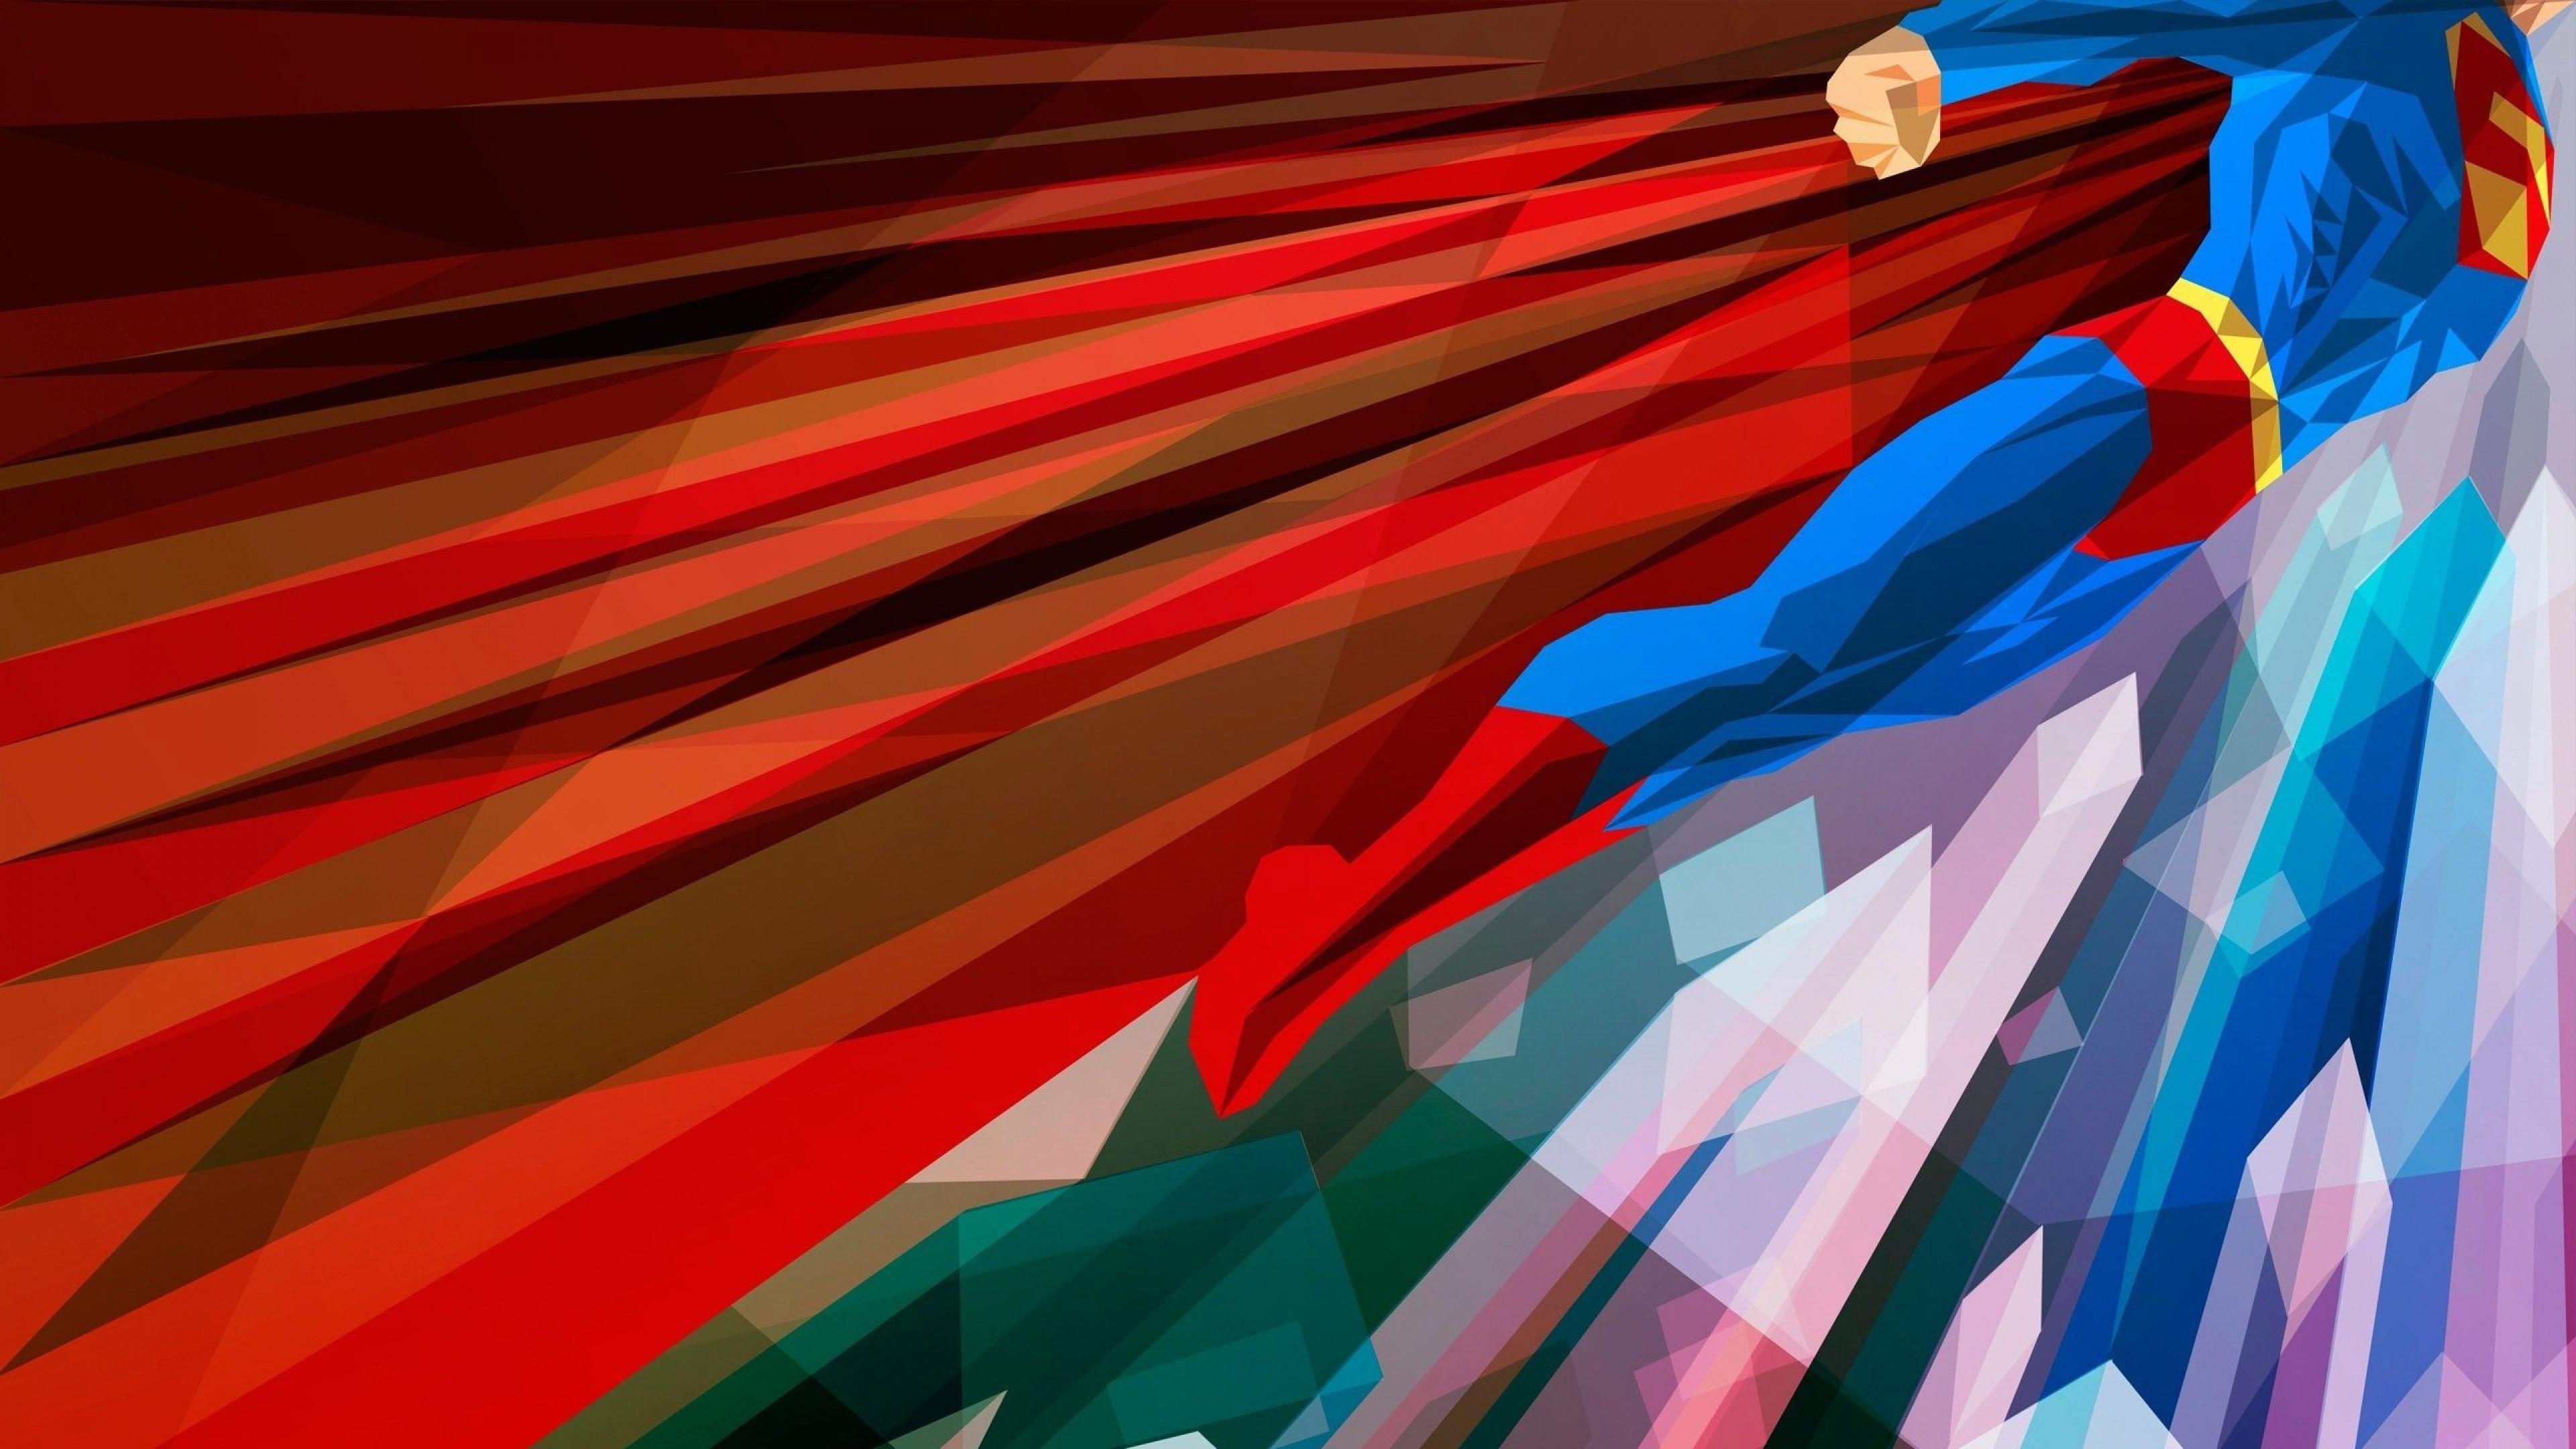 Download Wallpaper 3840x2160 Superhero Superman Bright 4K Ultra HD 3840x2160